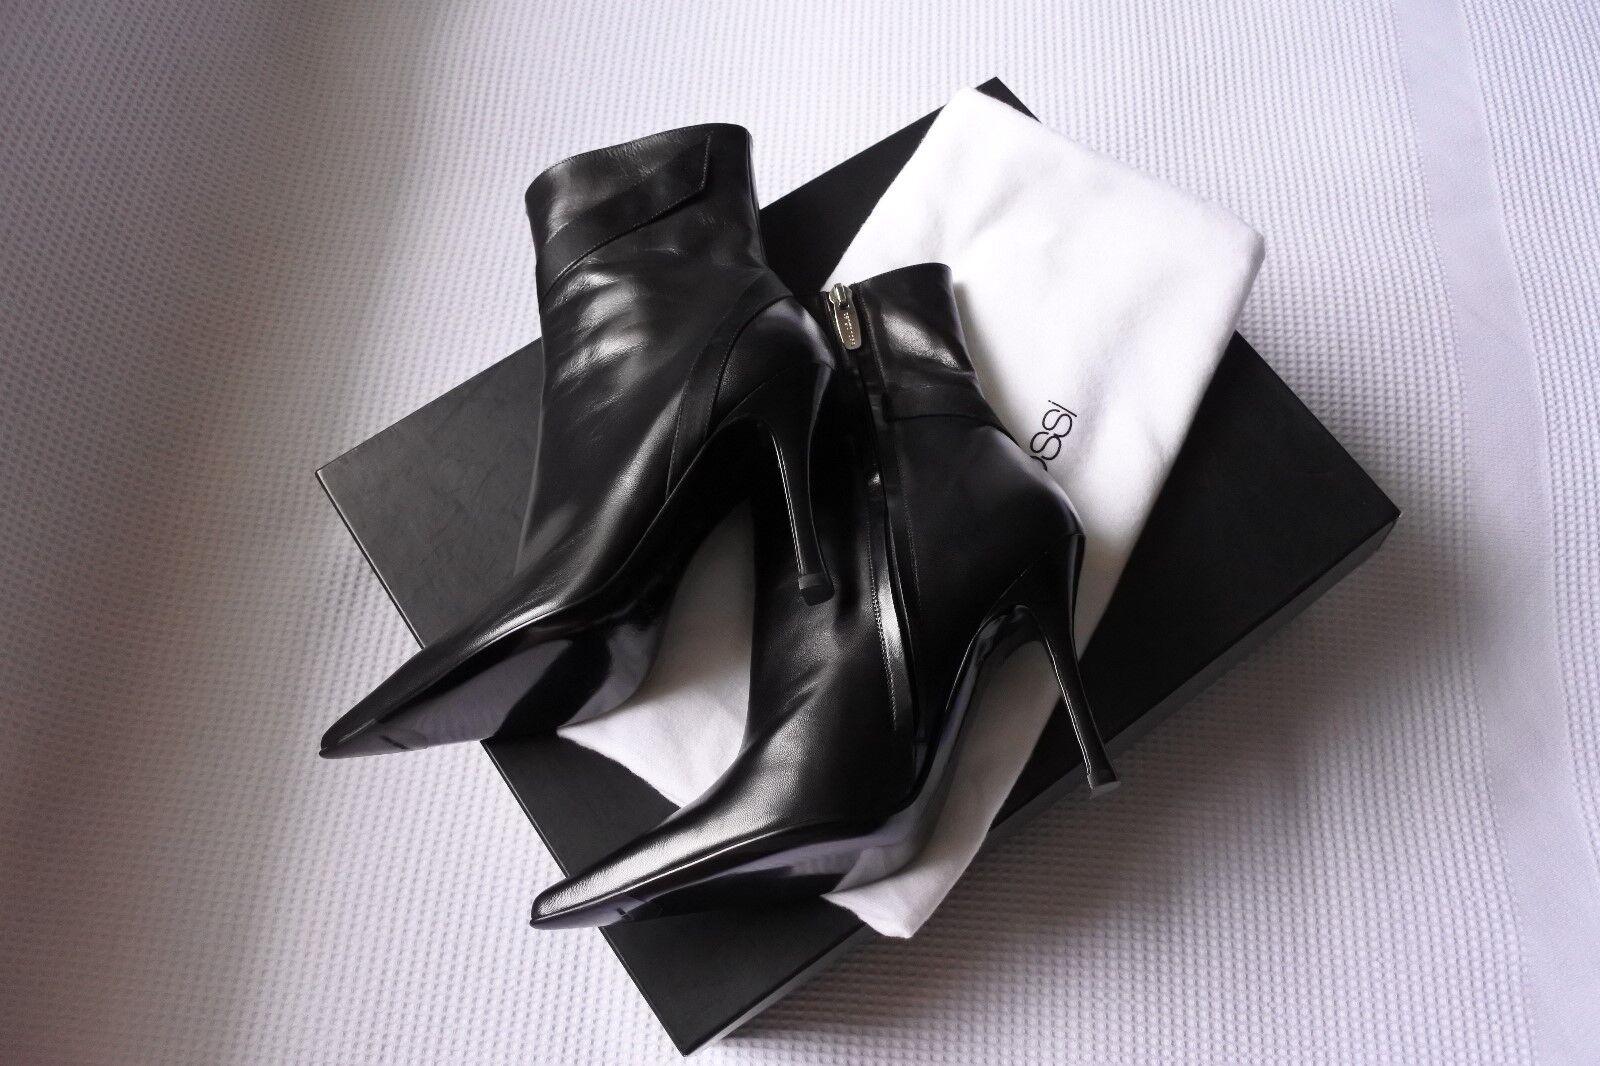 BN ladies' SERGIO ROSSI black leather Komodo ankle boots EU 35 UK 2 US 5